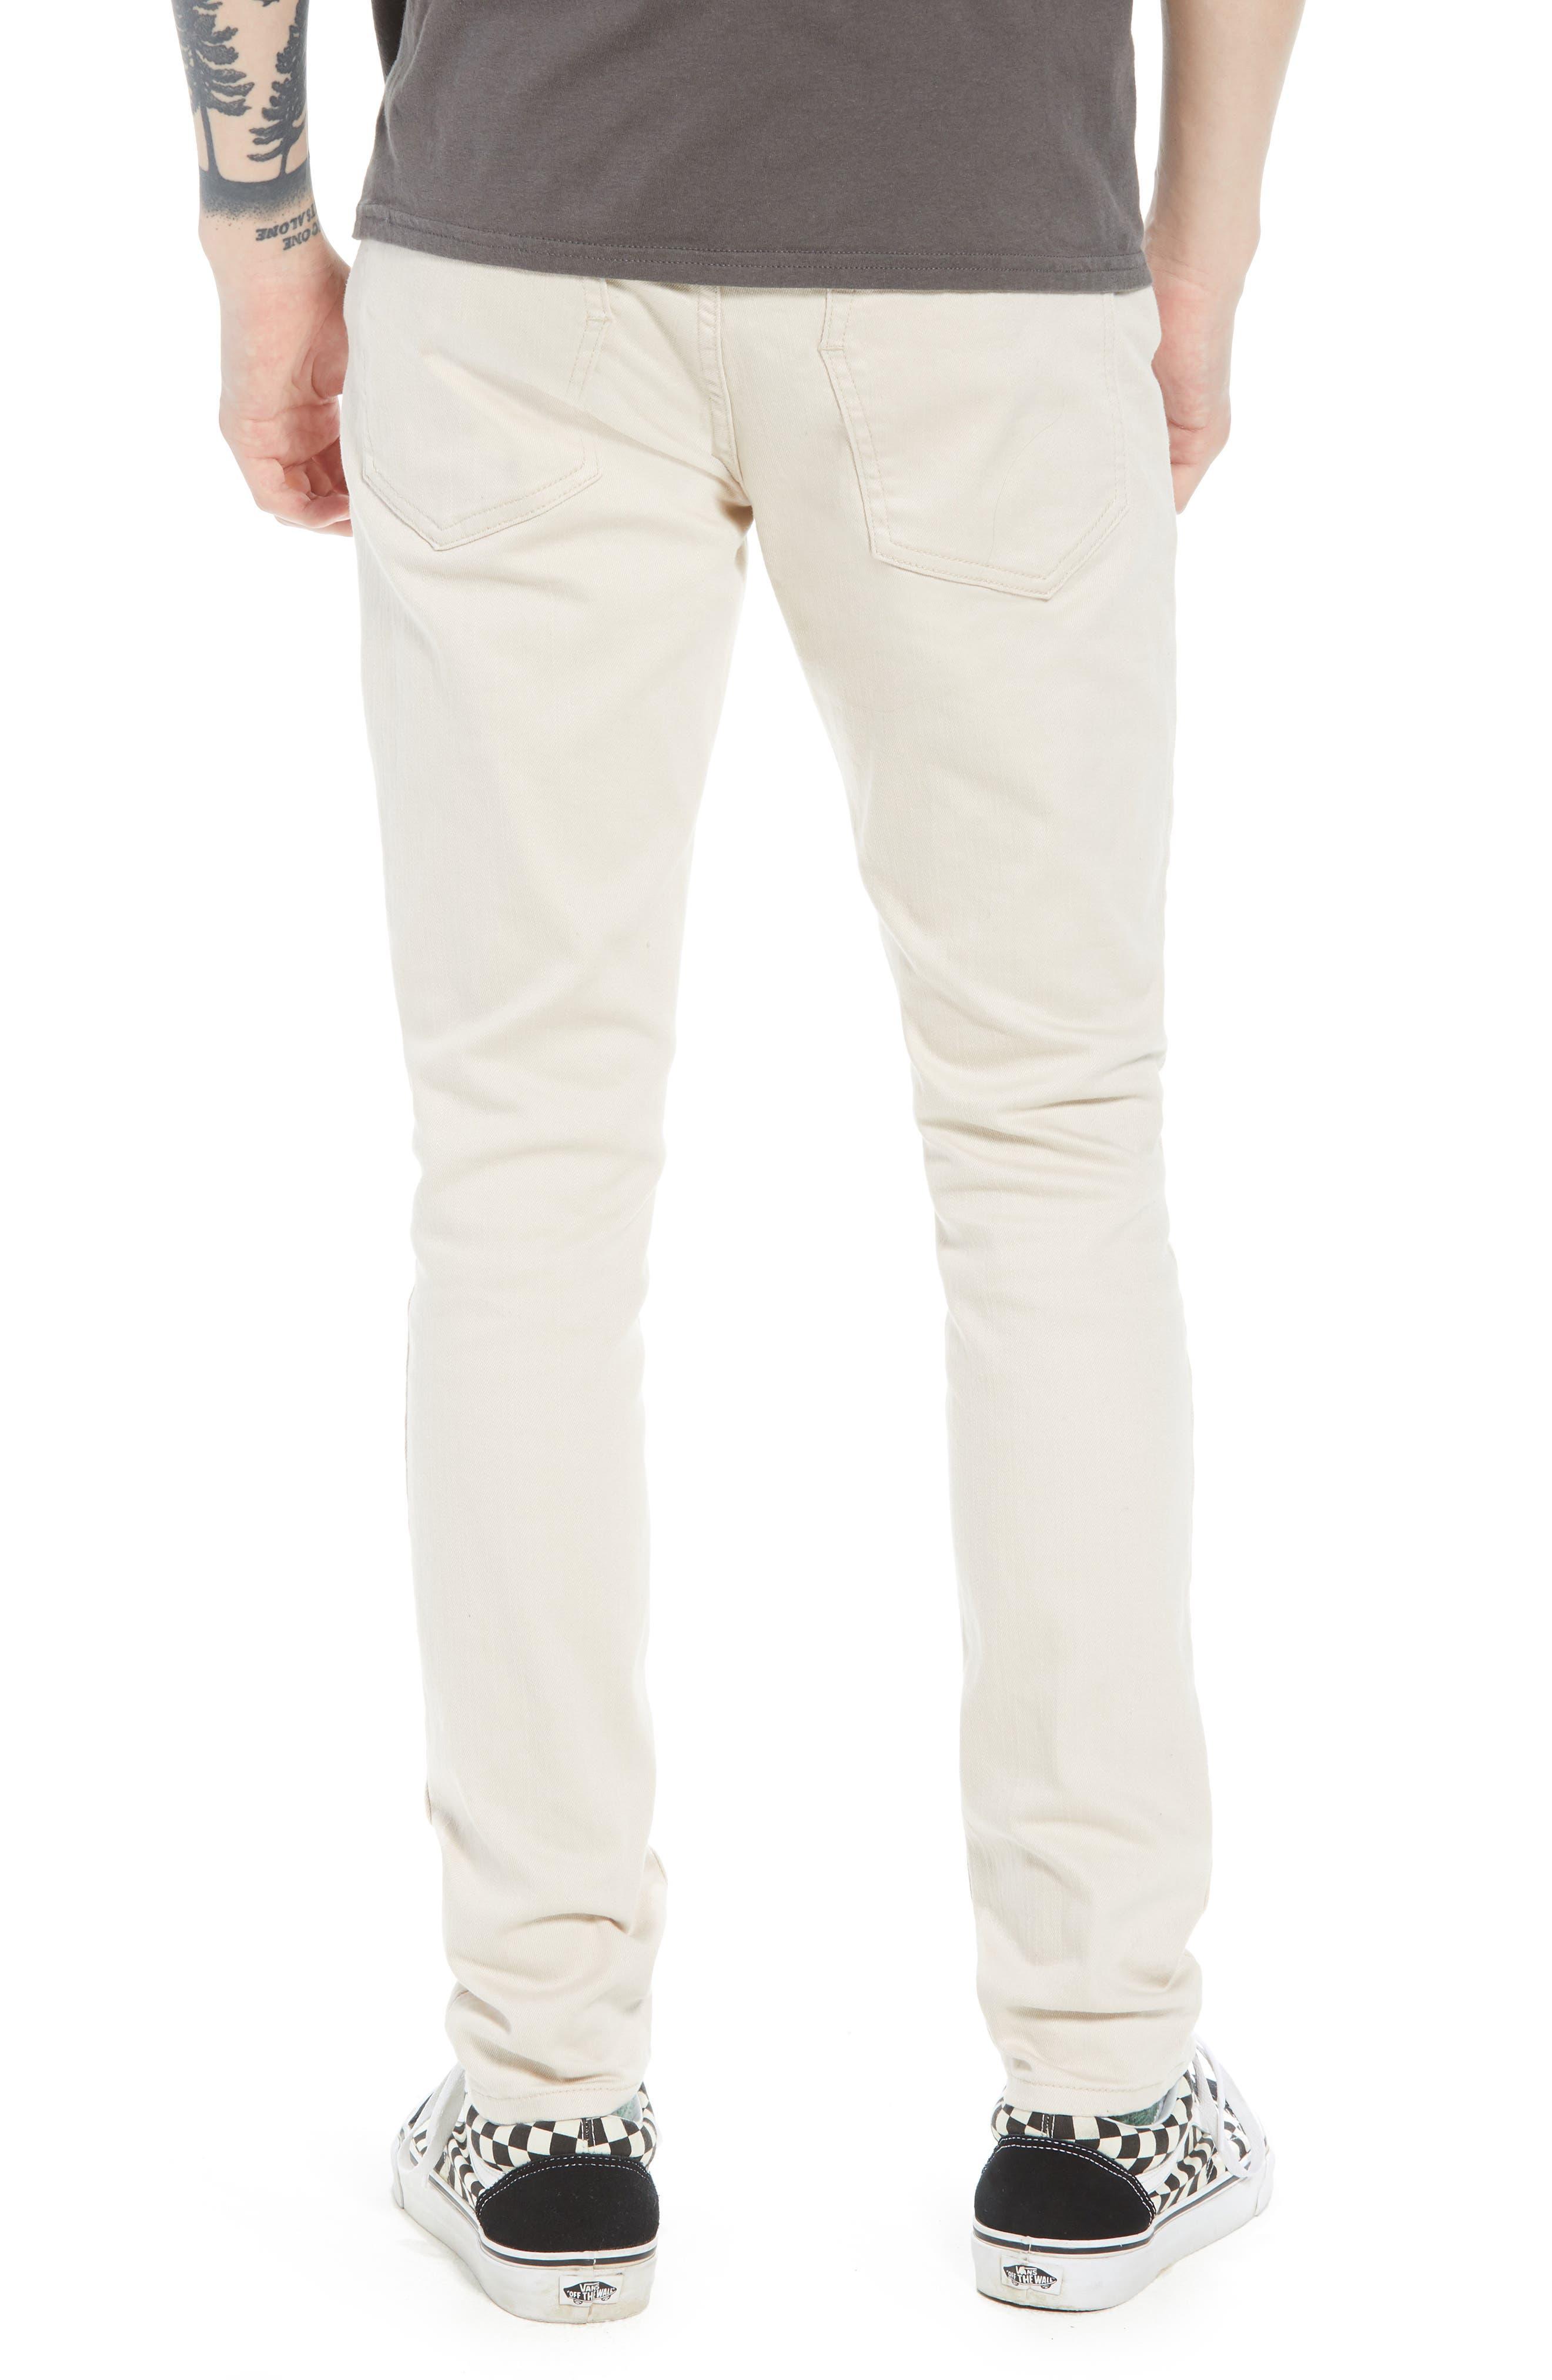 Joe Blow Slim Fit Jeans,                             Alternate thumbnail 2, color,                             901